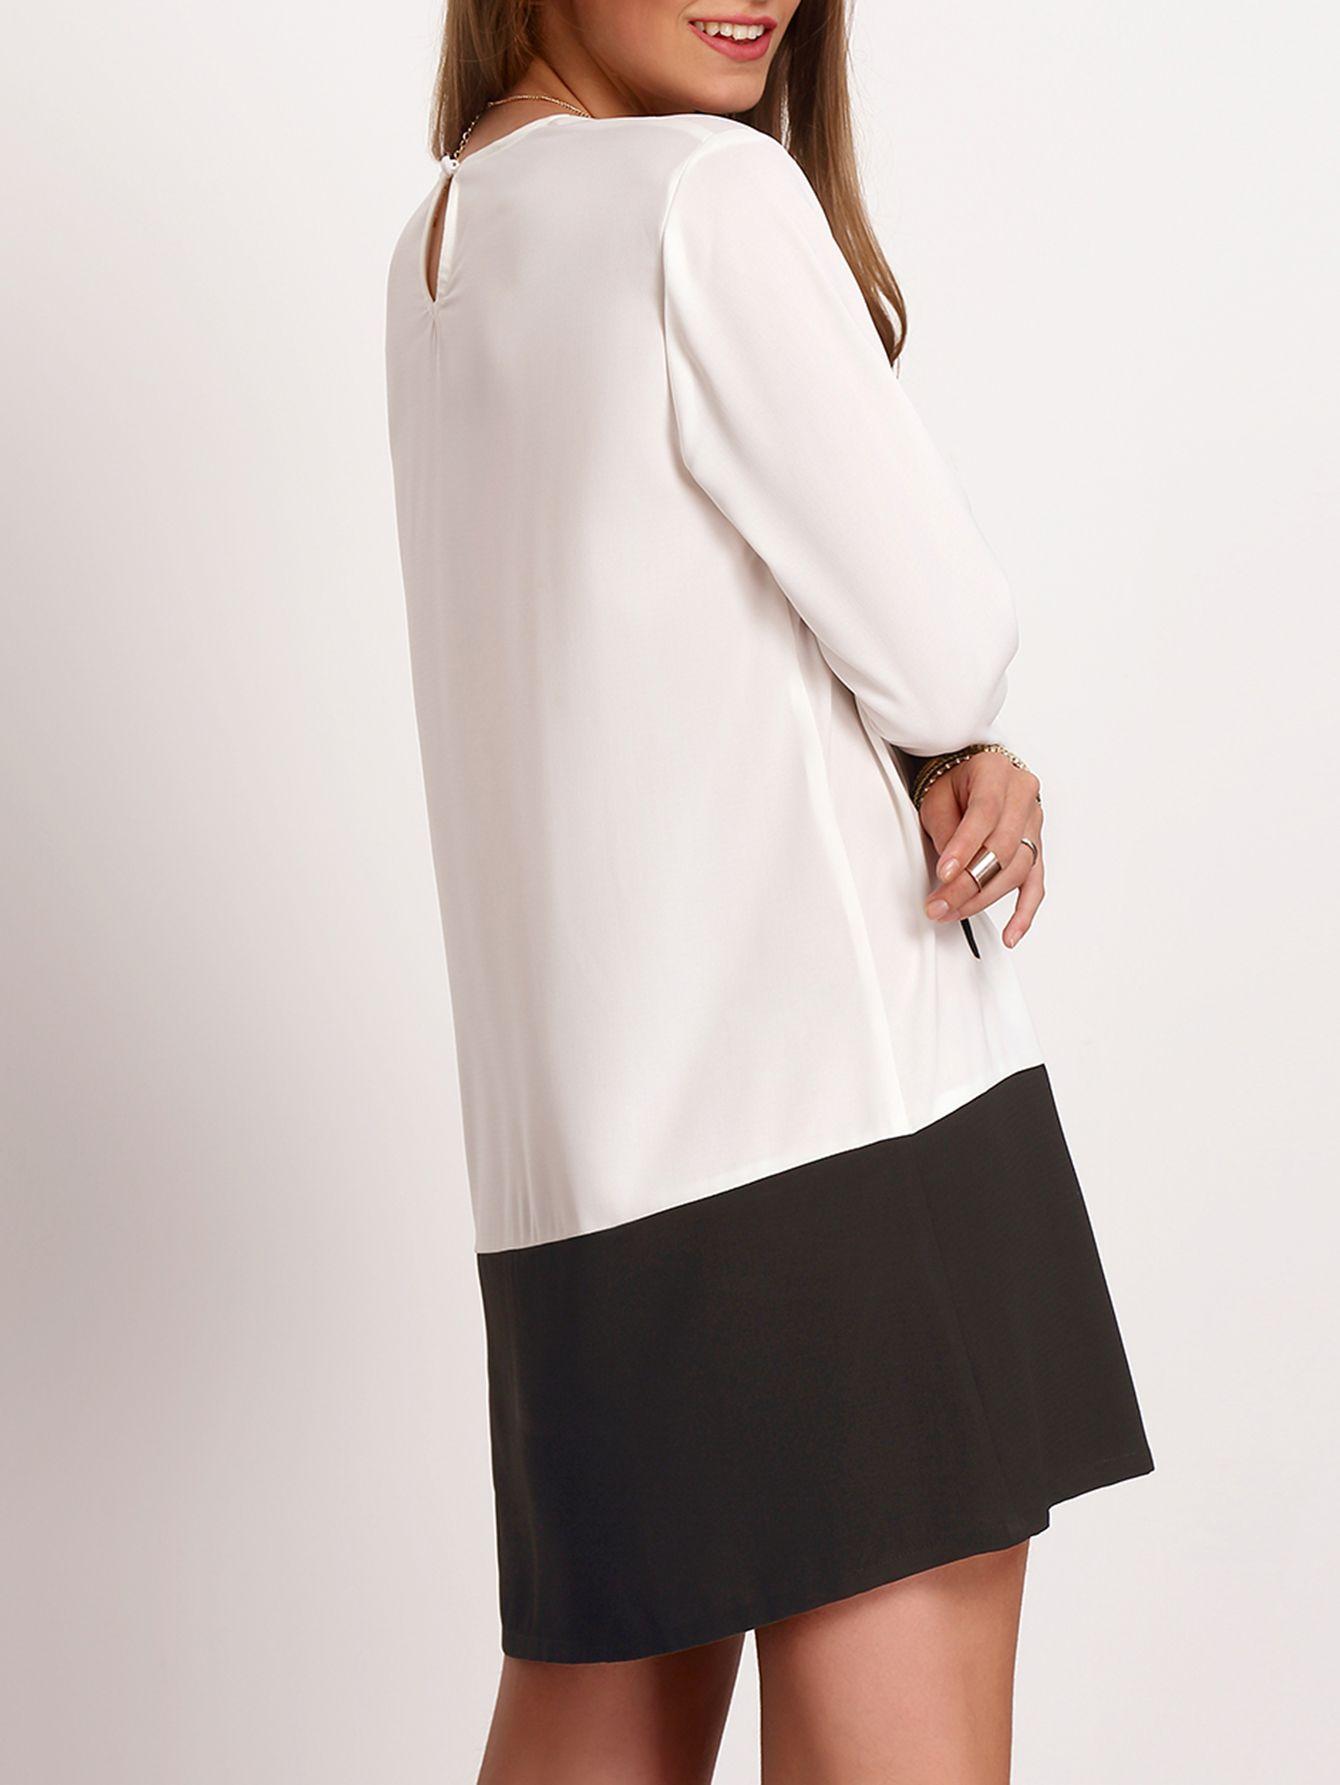 Shop White Black Crew Neck Pockets Color Block Dress online. SheIn offers White Black Crew Neck Pockets Color Block Dress & more to fit your fashionable needs.